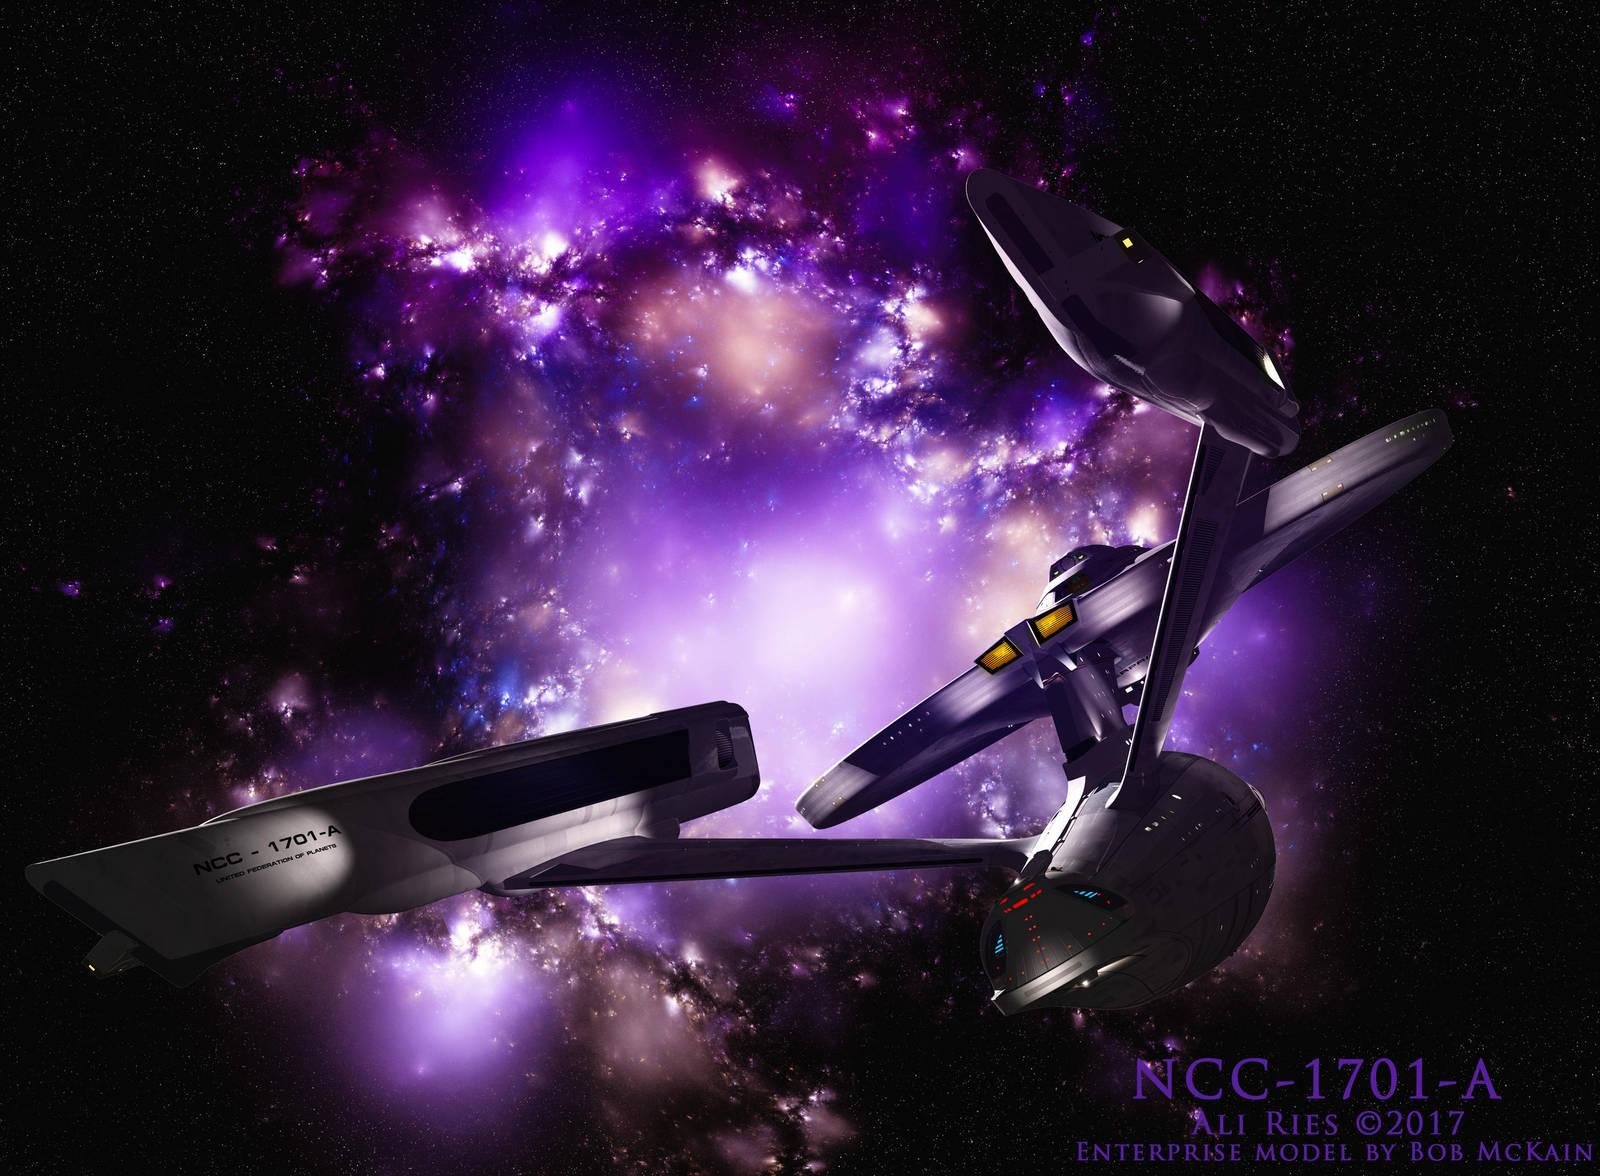 NCC-1701-A by Ali Ries 2017 by Casperium